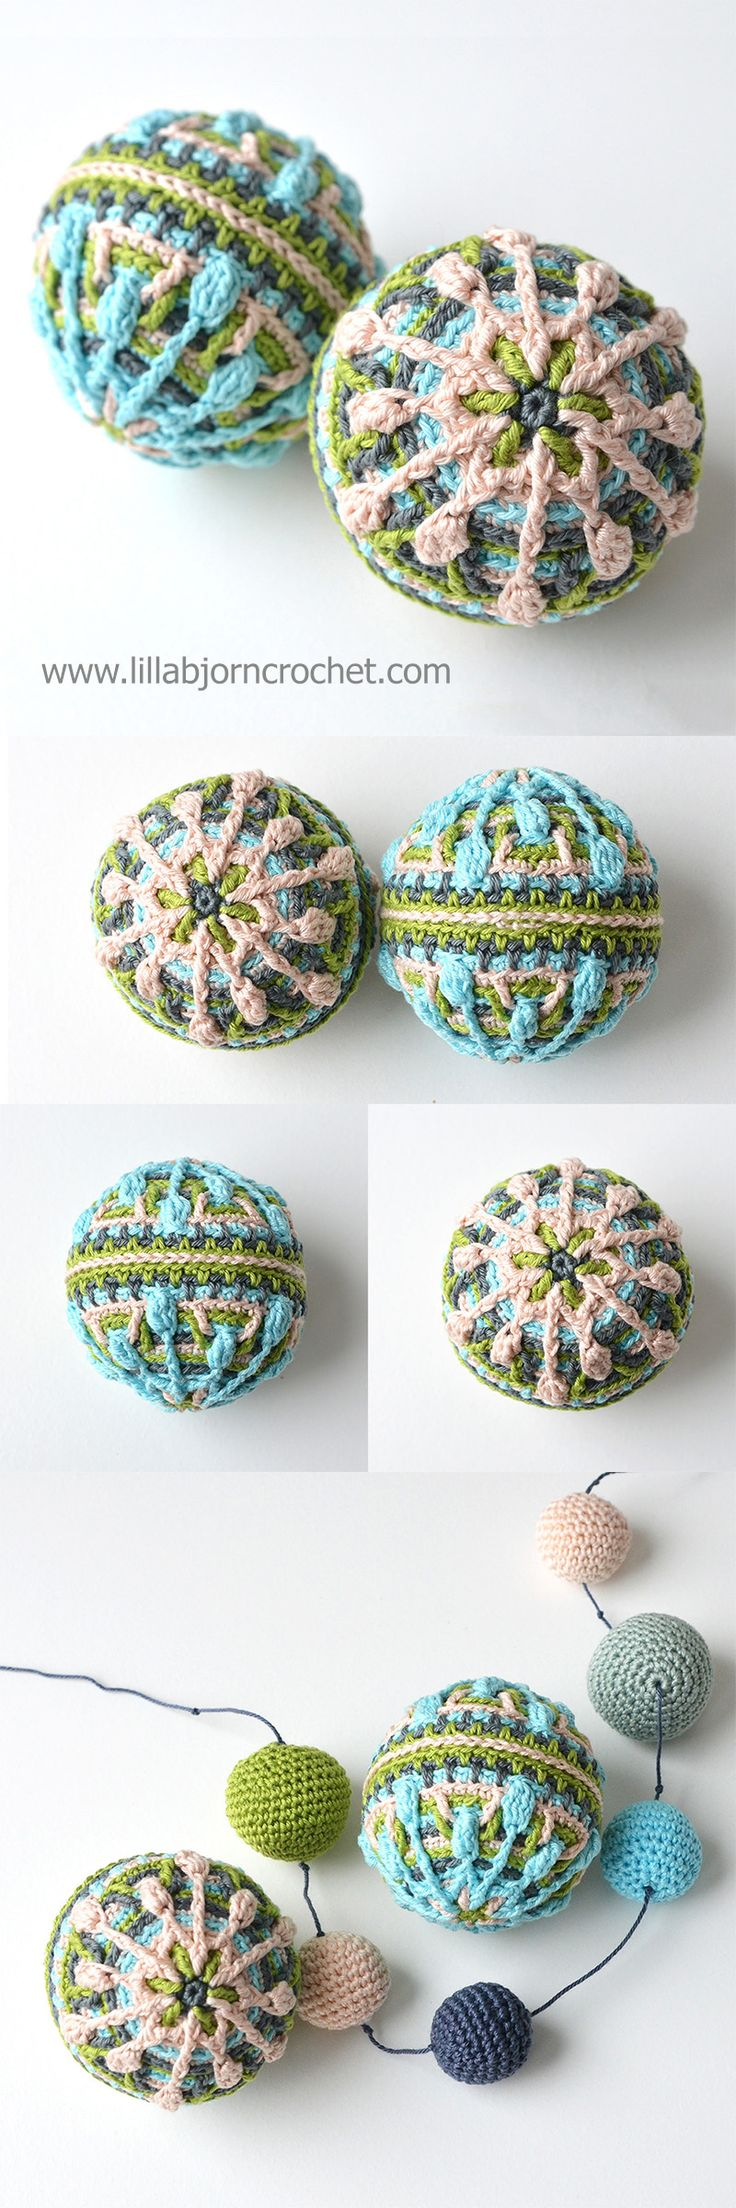 878 mejores imágenes sobre Cute Crochet / knitting en Pinterest ...